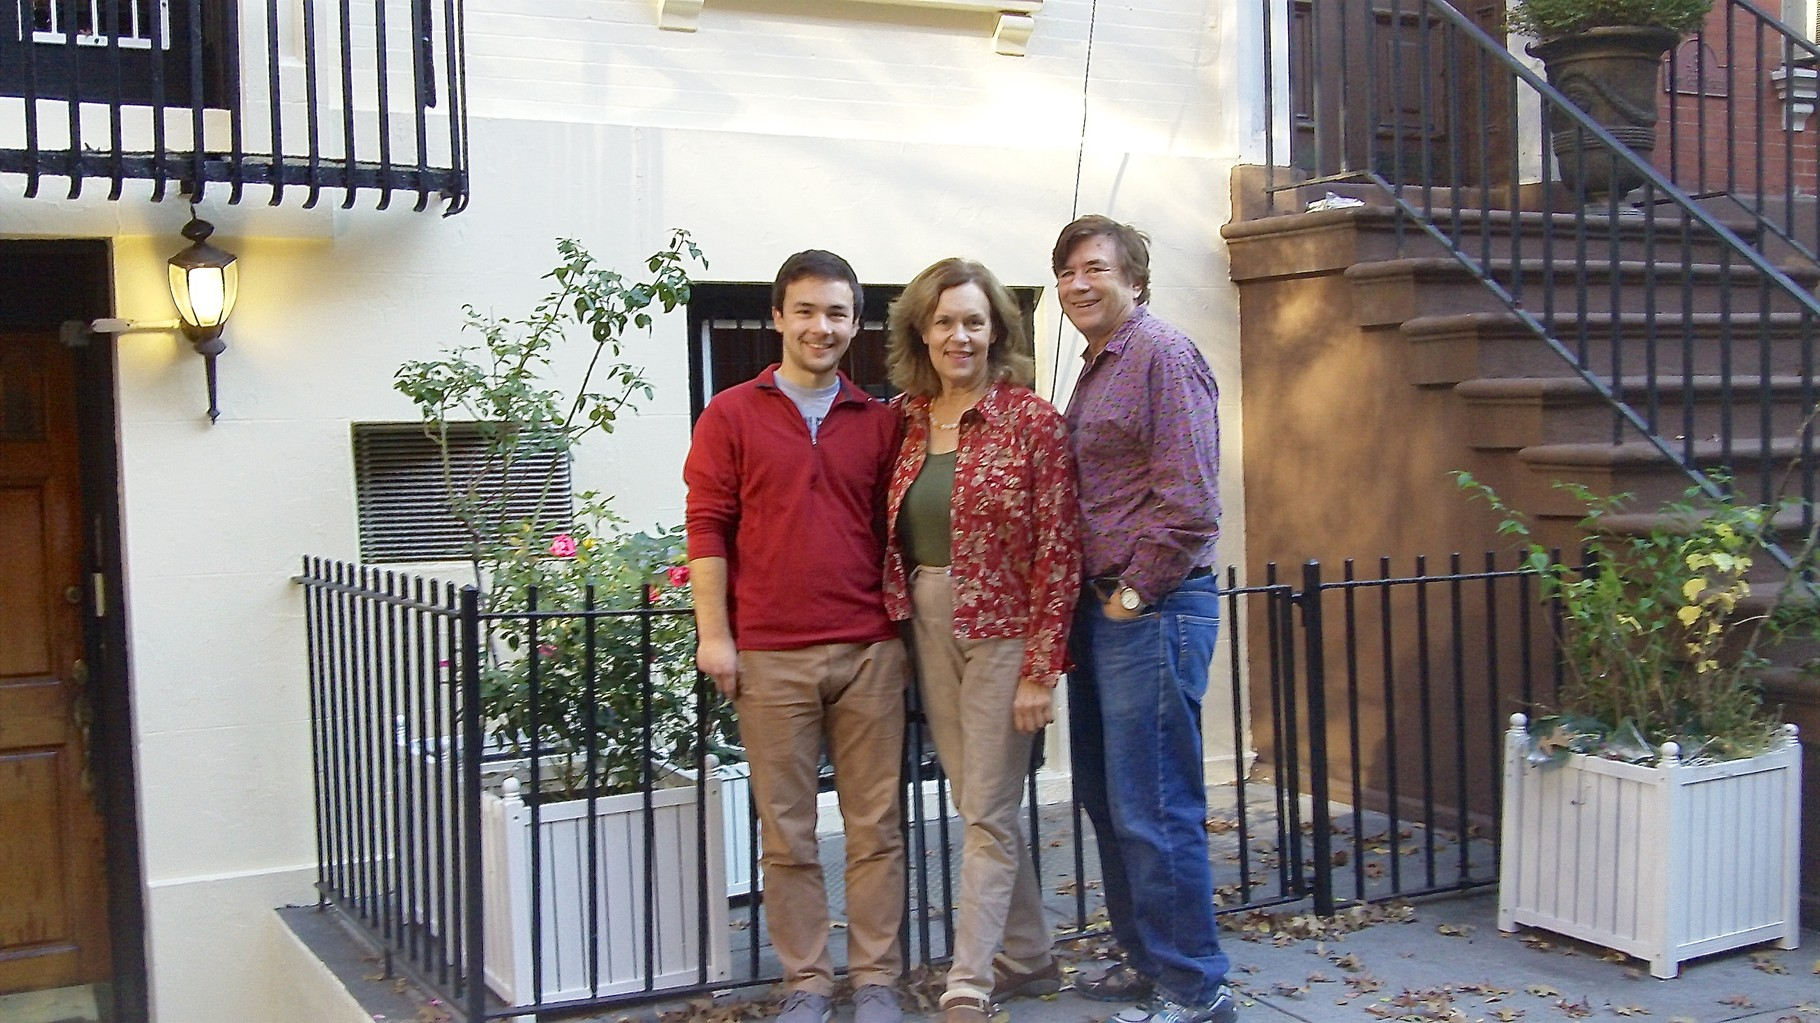 Trevan, Lorraine, & John  Nov. 8,  2015  Trevan is Lorraine's cousin Cyndi's son-he attends Cornell University